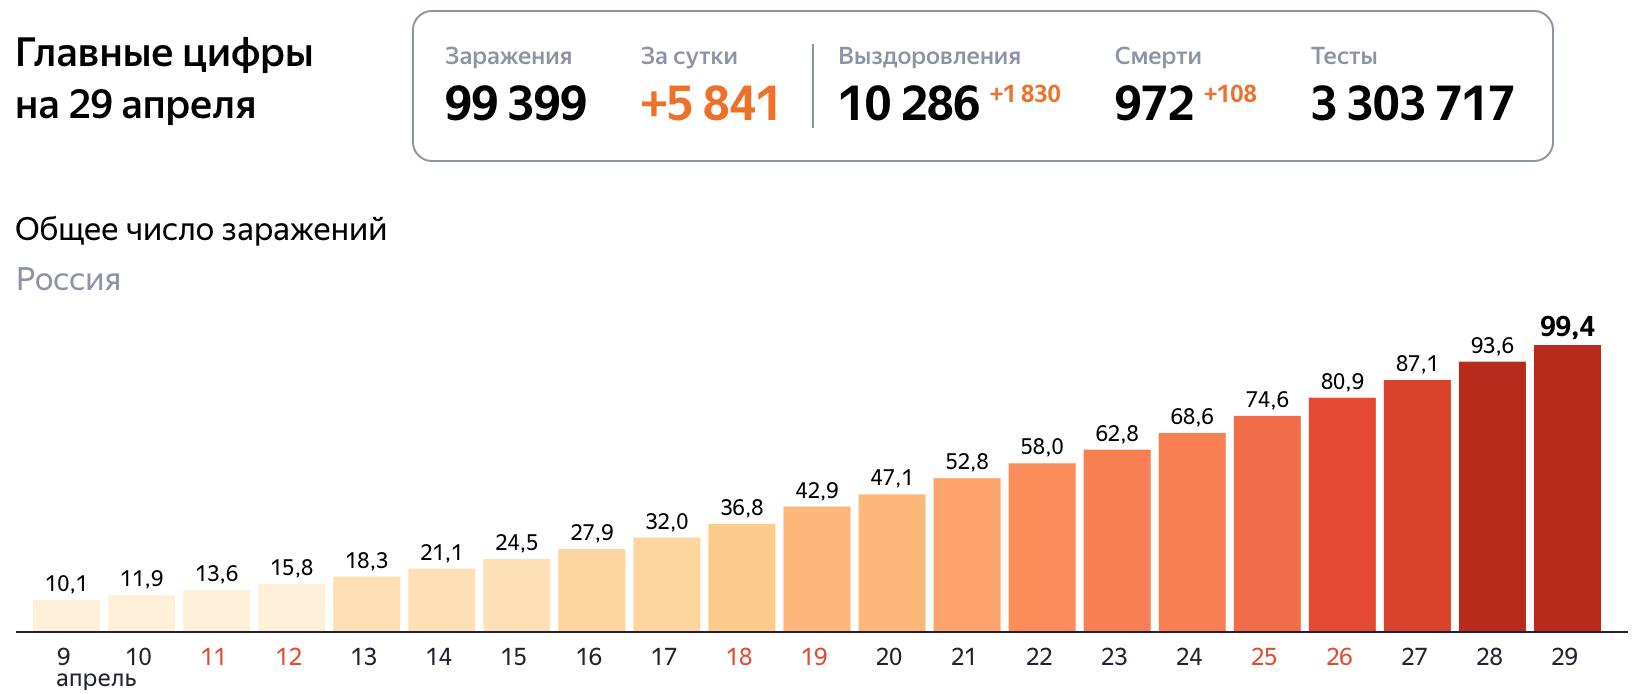 Коронавирус статистика 29 апреля 2020 год в России